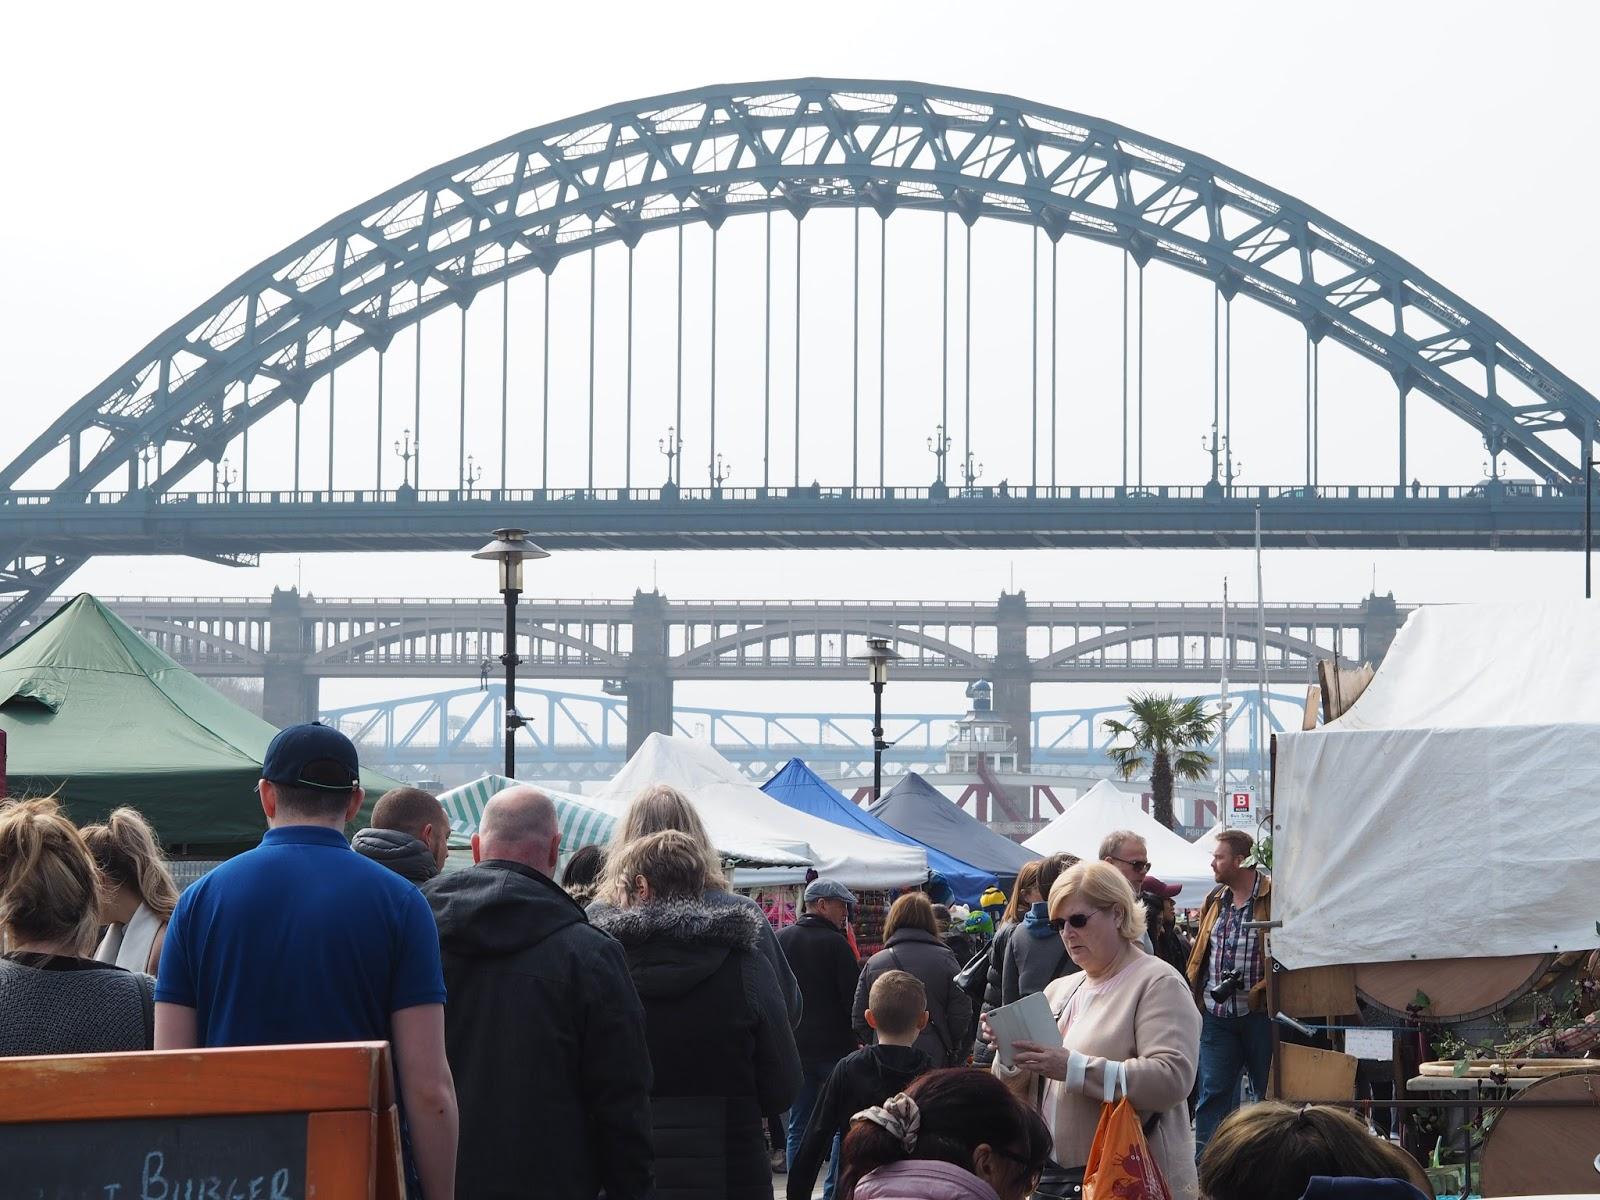 newcastle quayside street food market